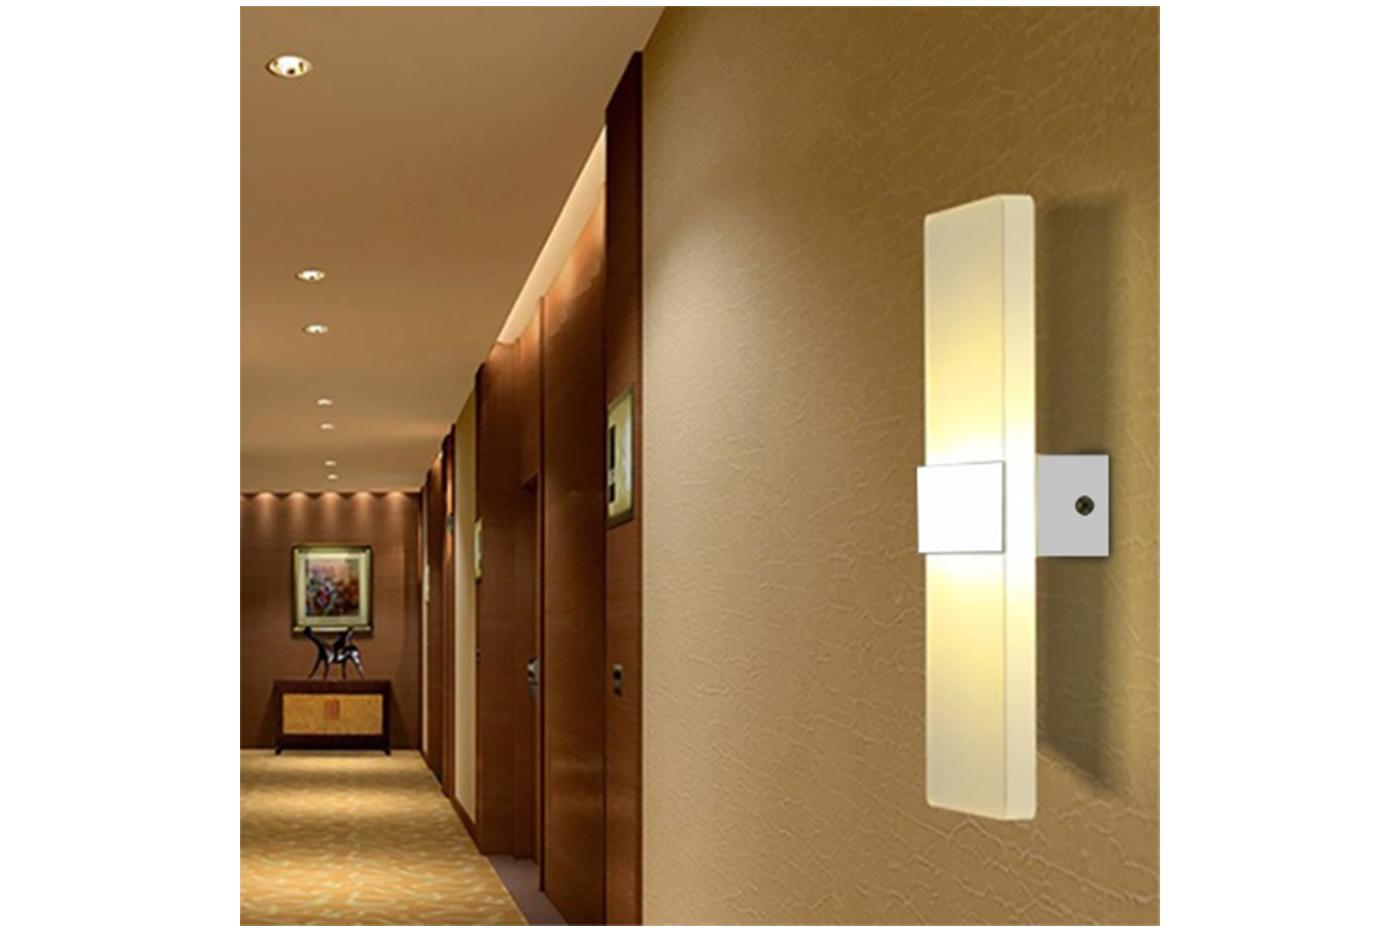 Plafoniere Da Parete A Led : Bes 25095 applique beselettronica lampada da parete